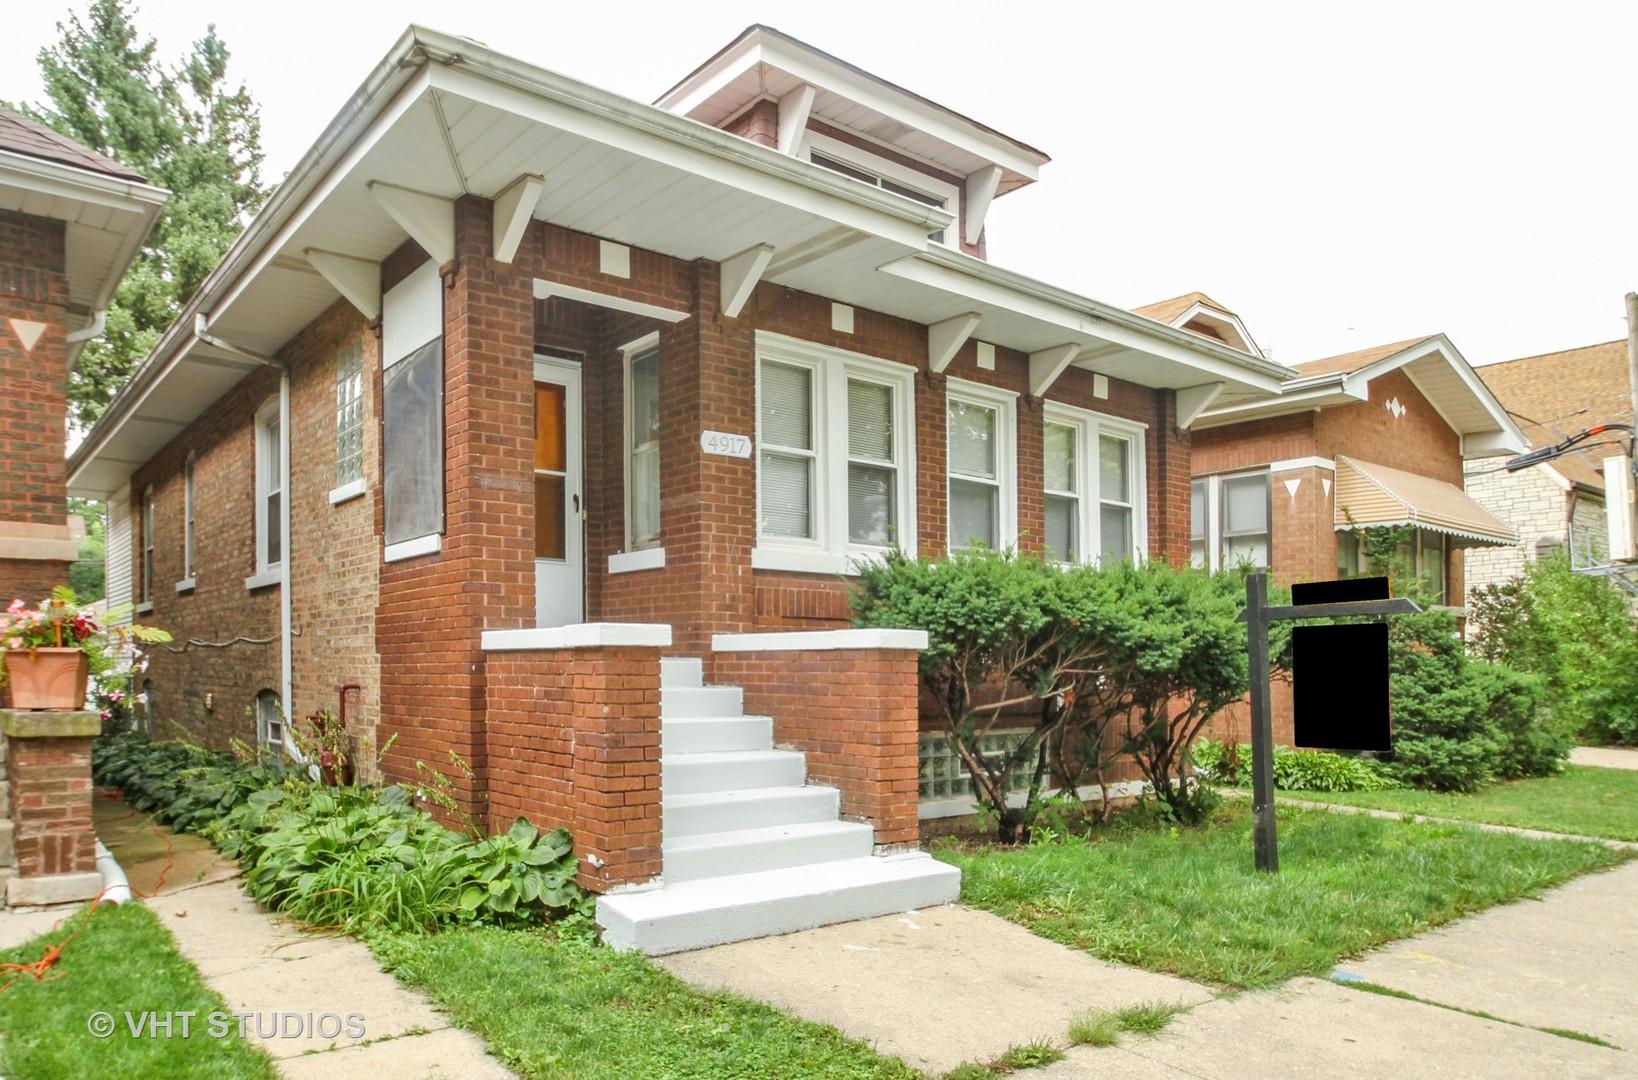 4917 North KOSTNER, CHICAGO, Illinois, 60630